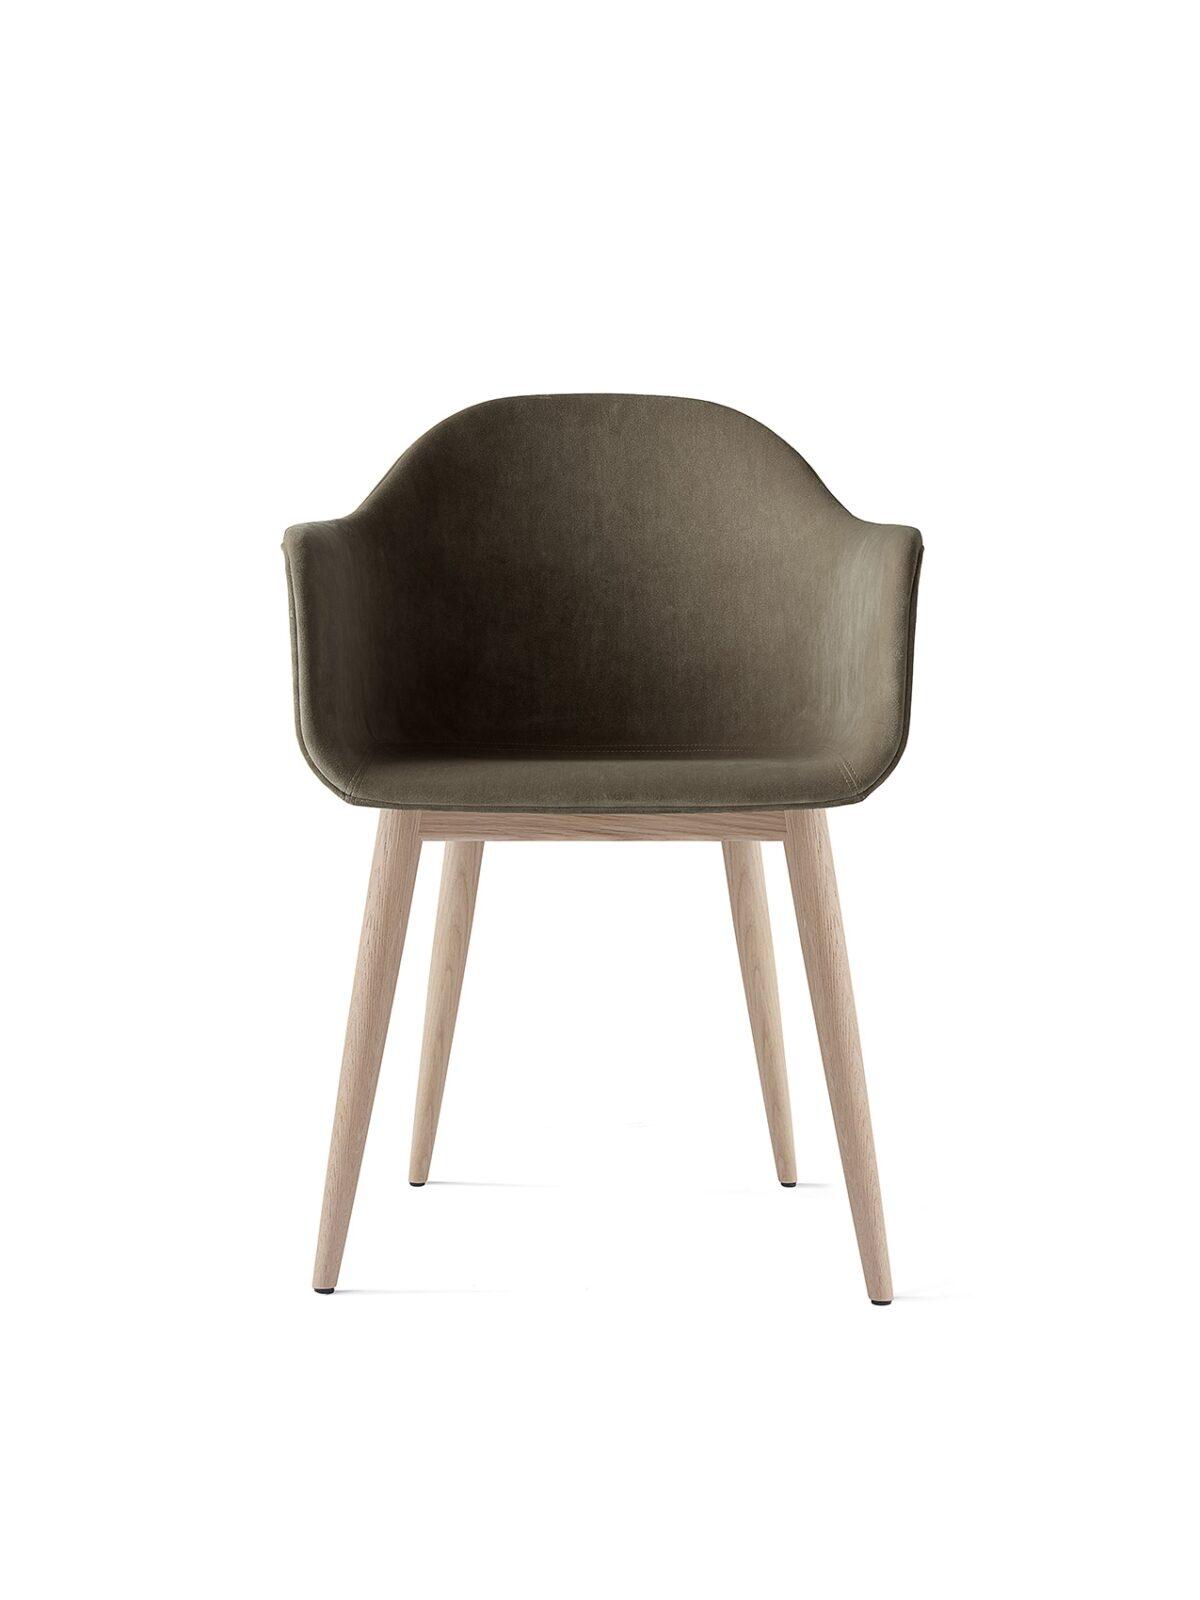 9350989 Harbour Chair CityVelvetCA7832 078 NaturalOak Front